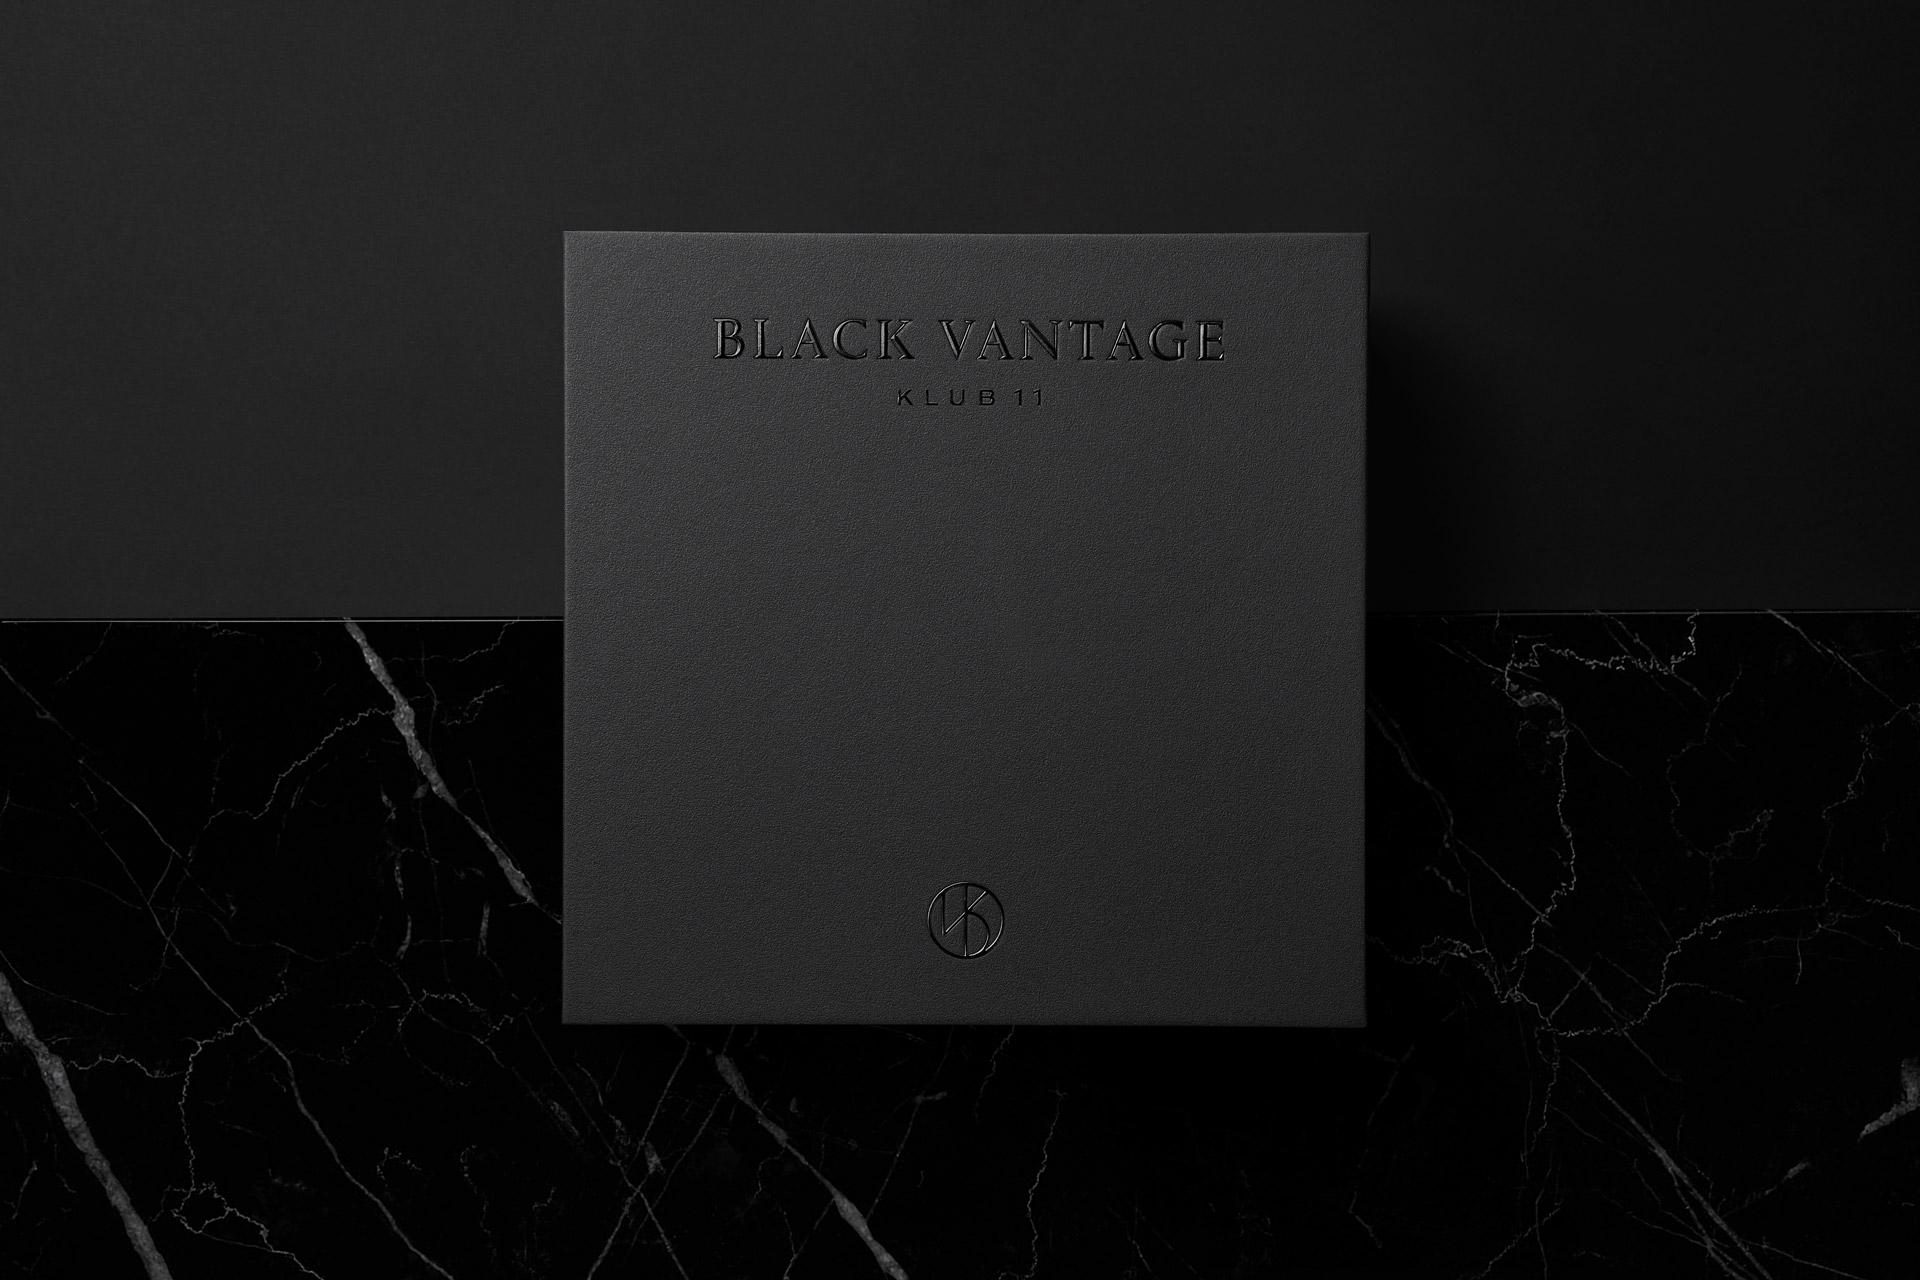 black-vantage_04